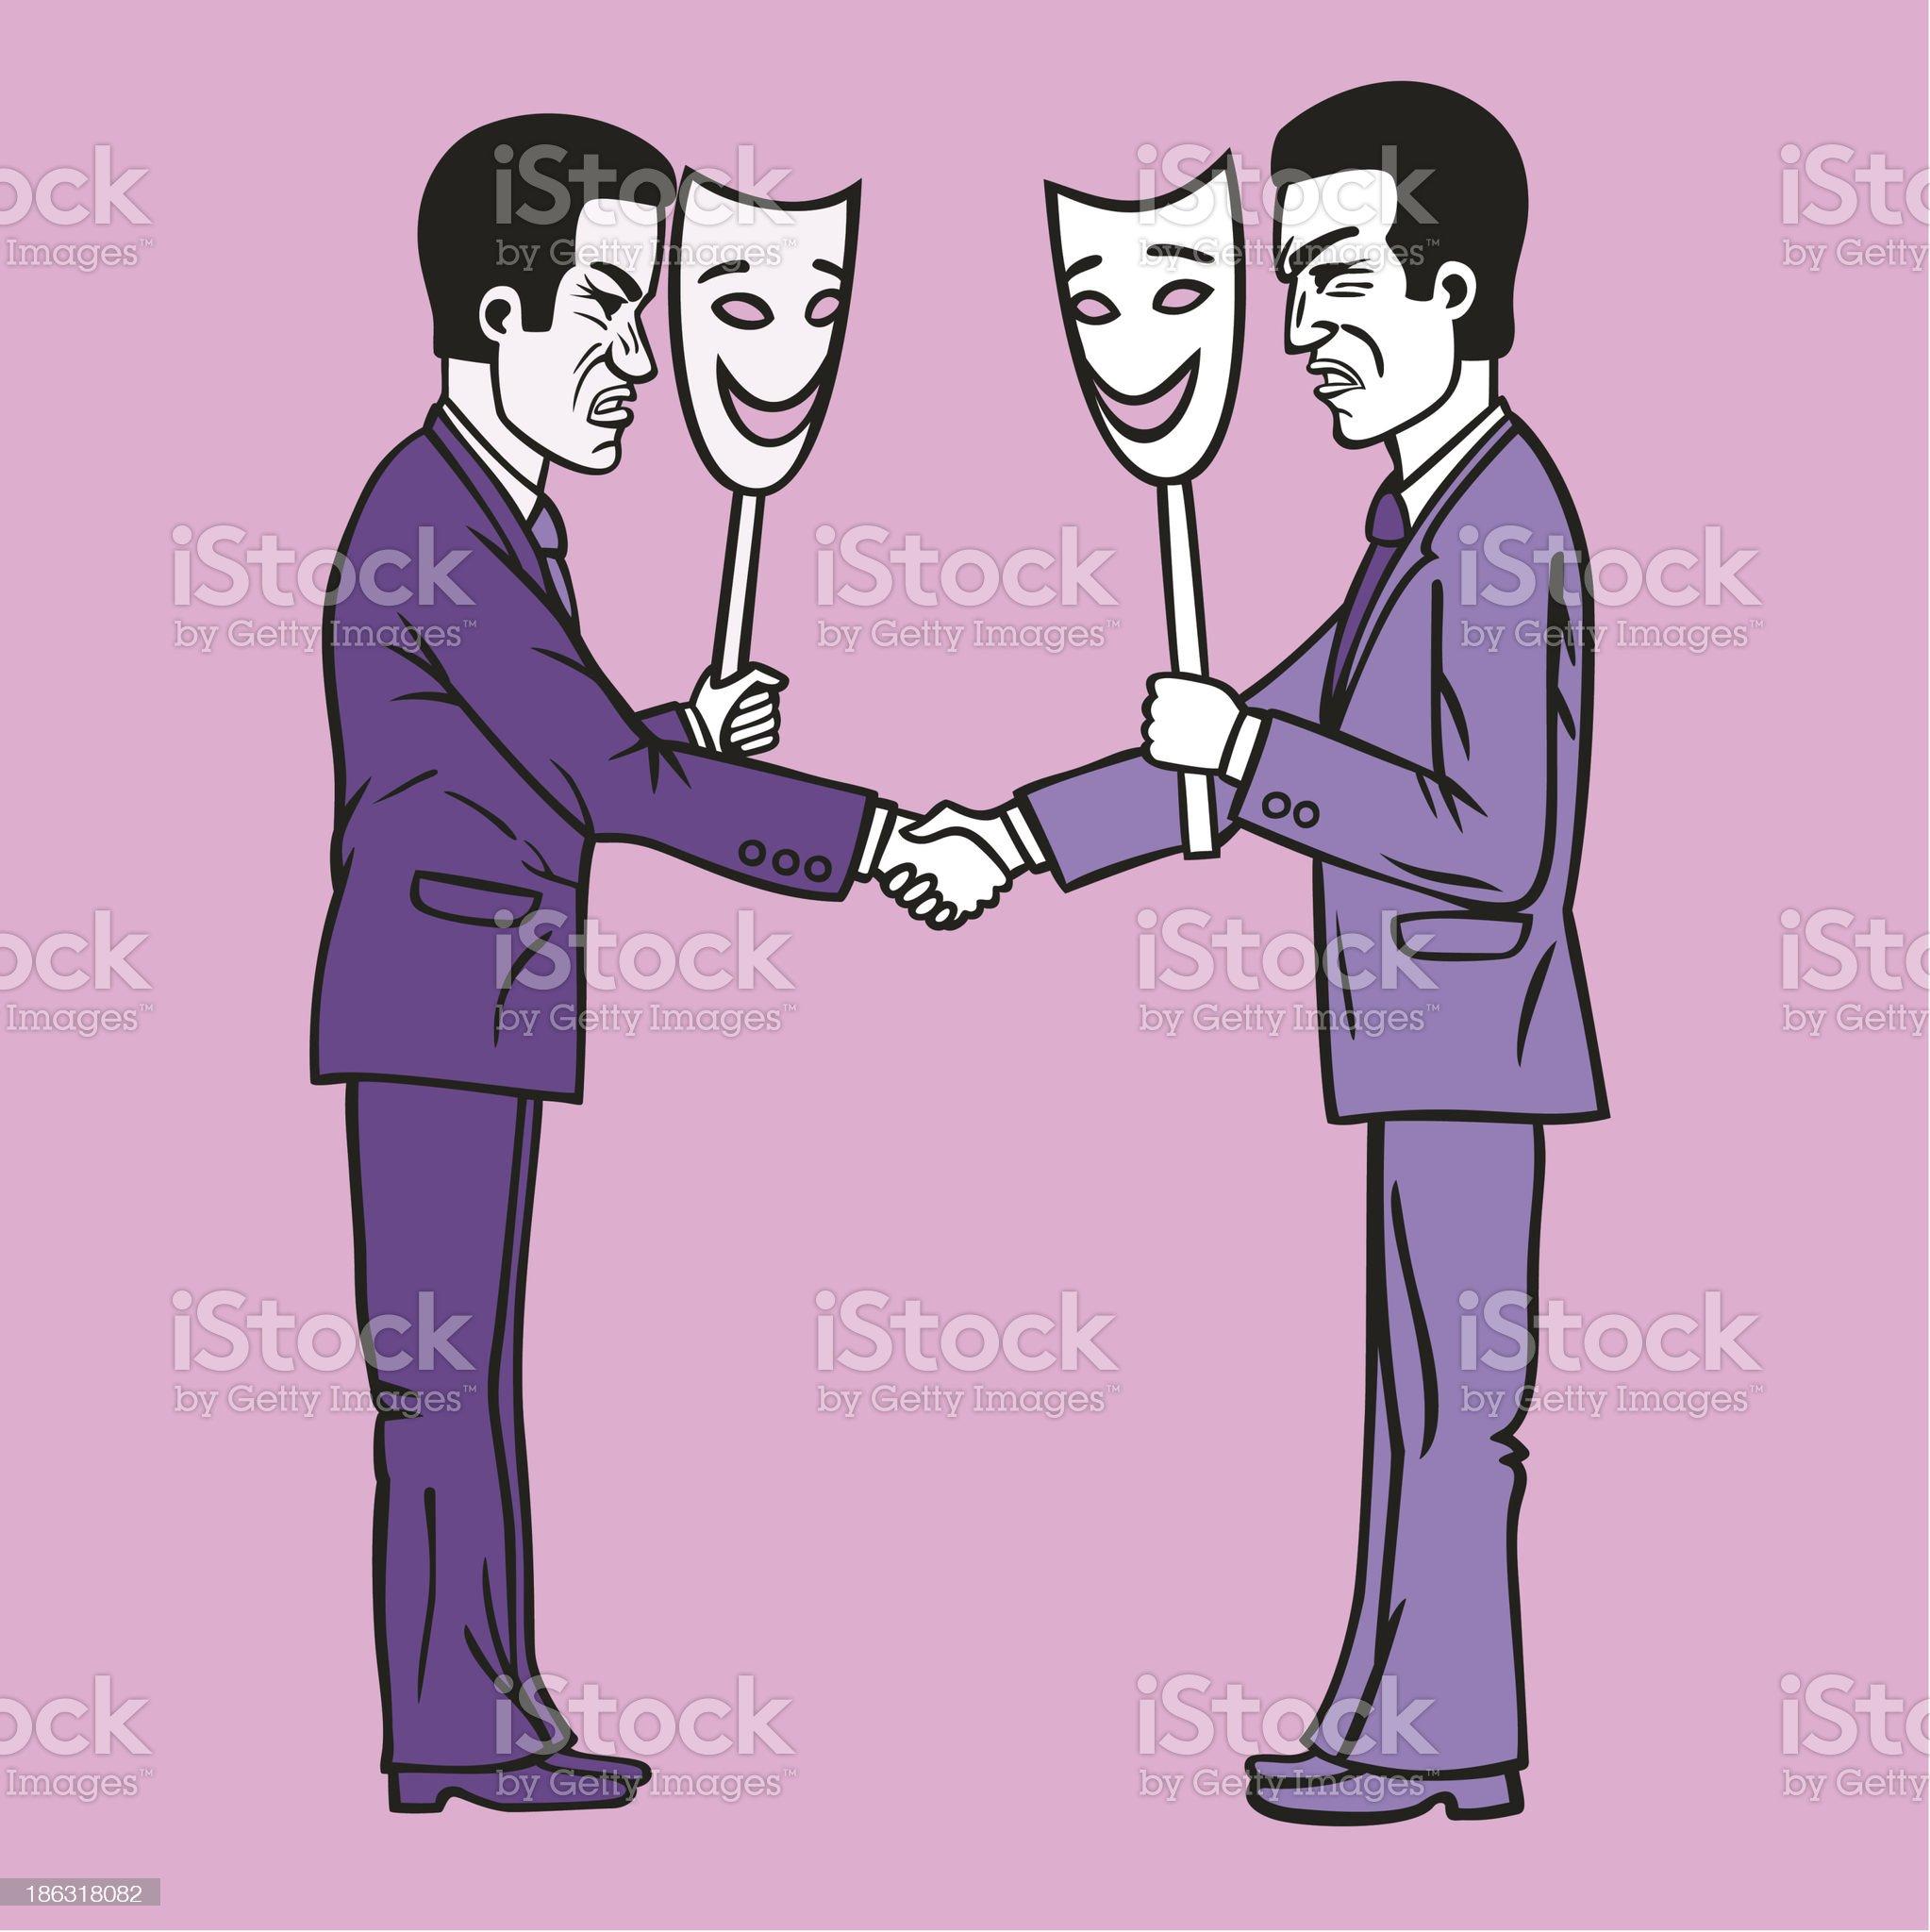 Businessmen. royalty-free stock vector art